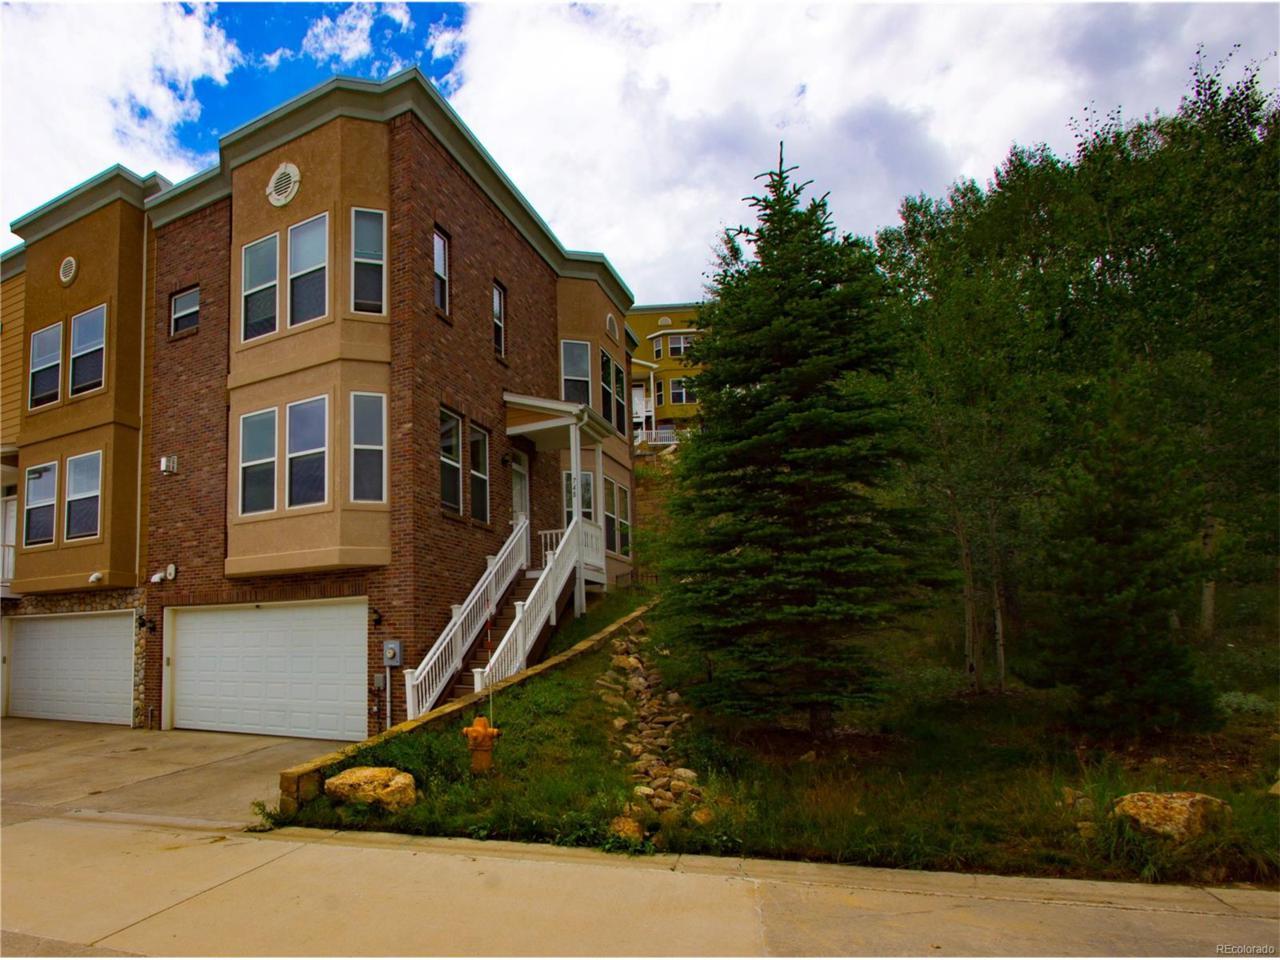 748 Louis Drive, Central City, CO 80427 (MLS #5418684) :: 8z Real Estate